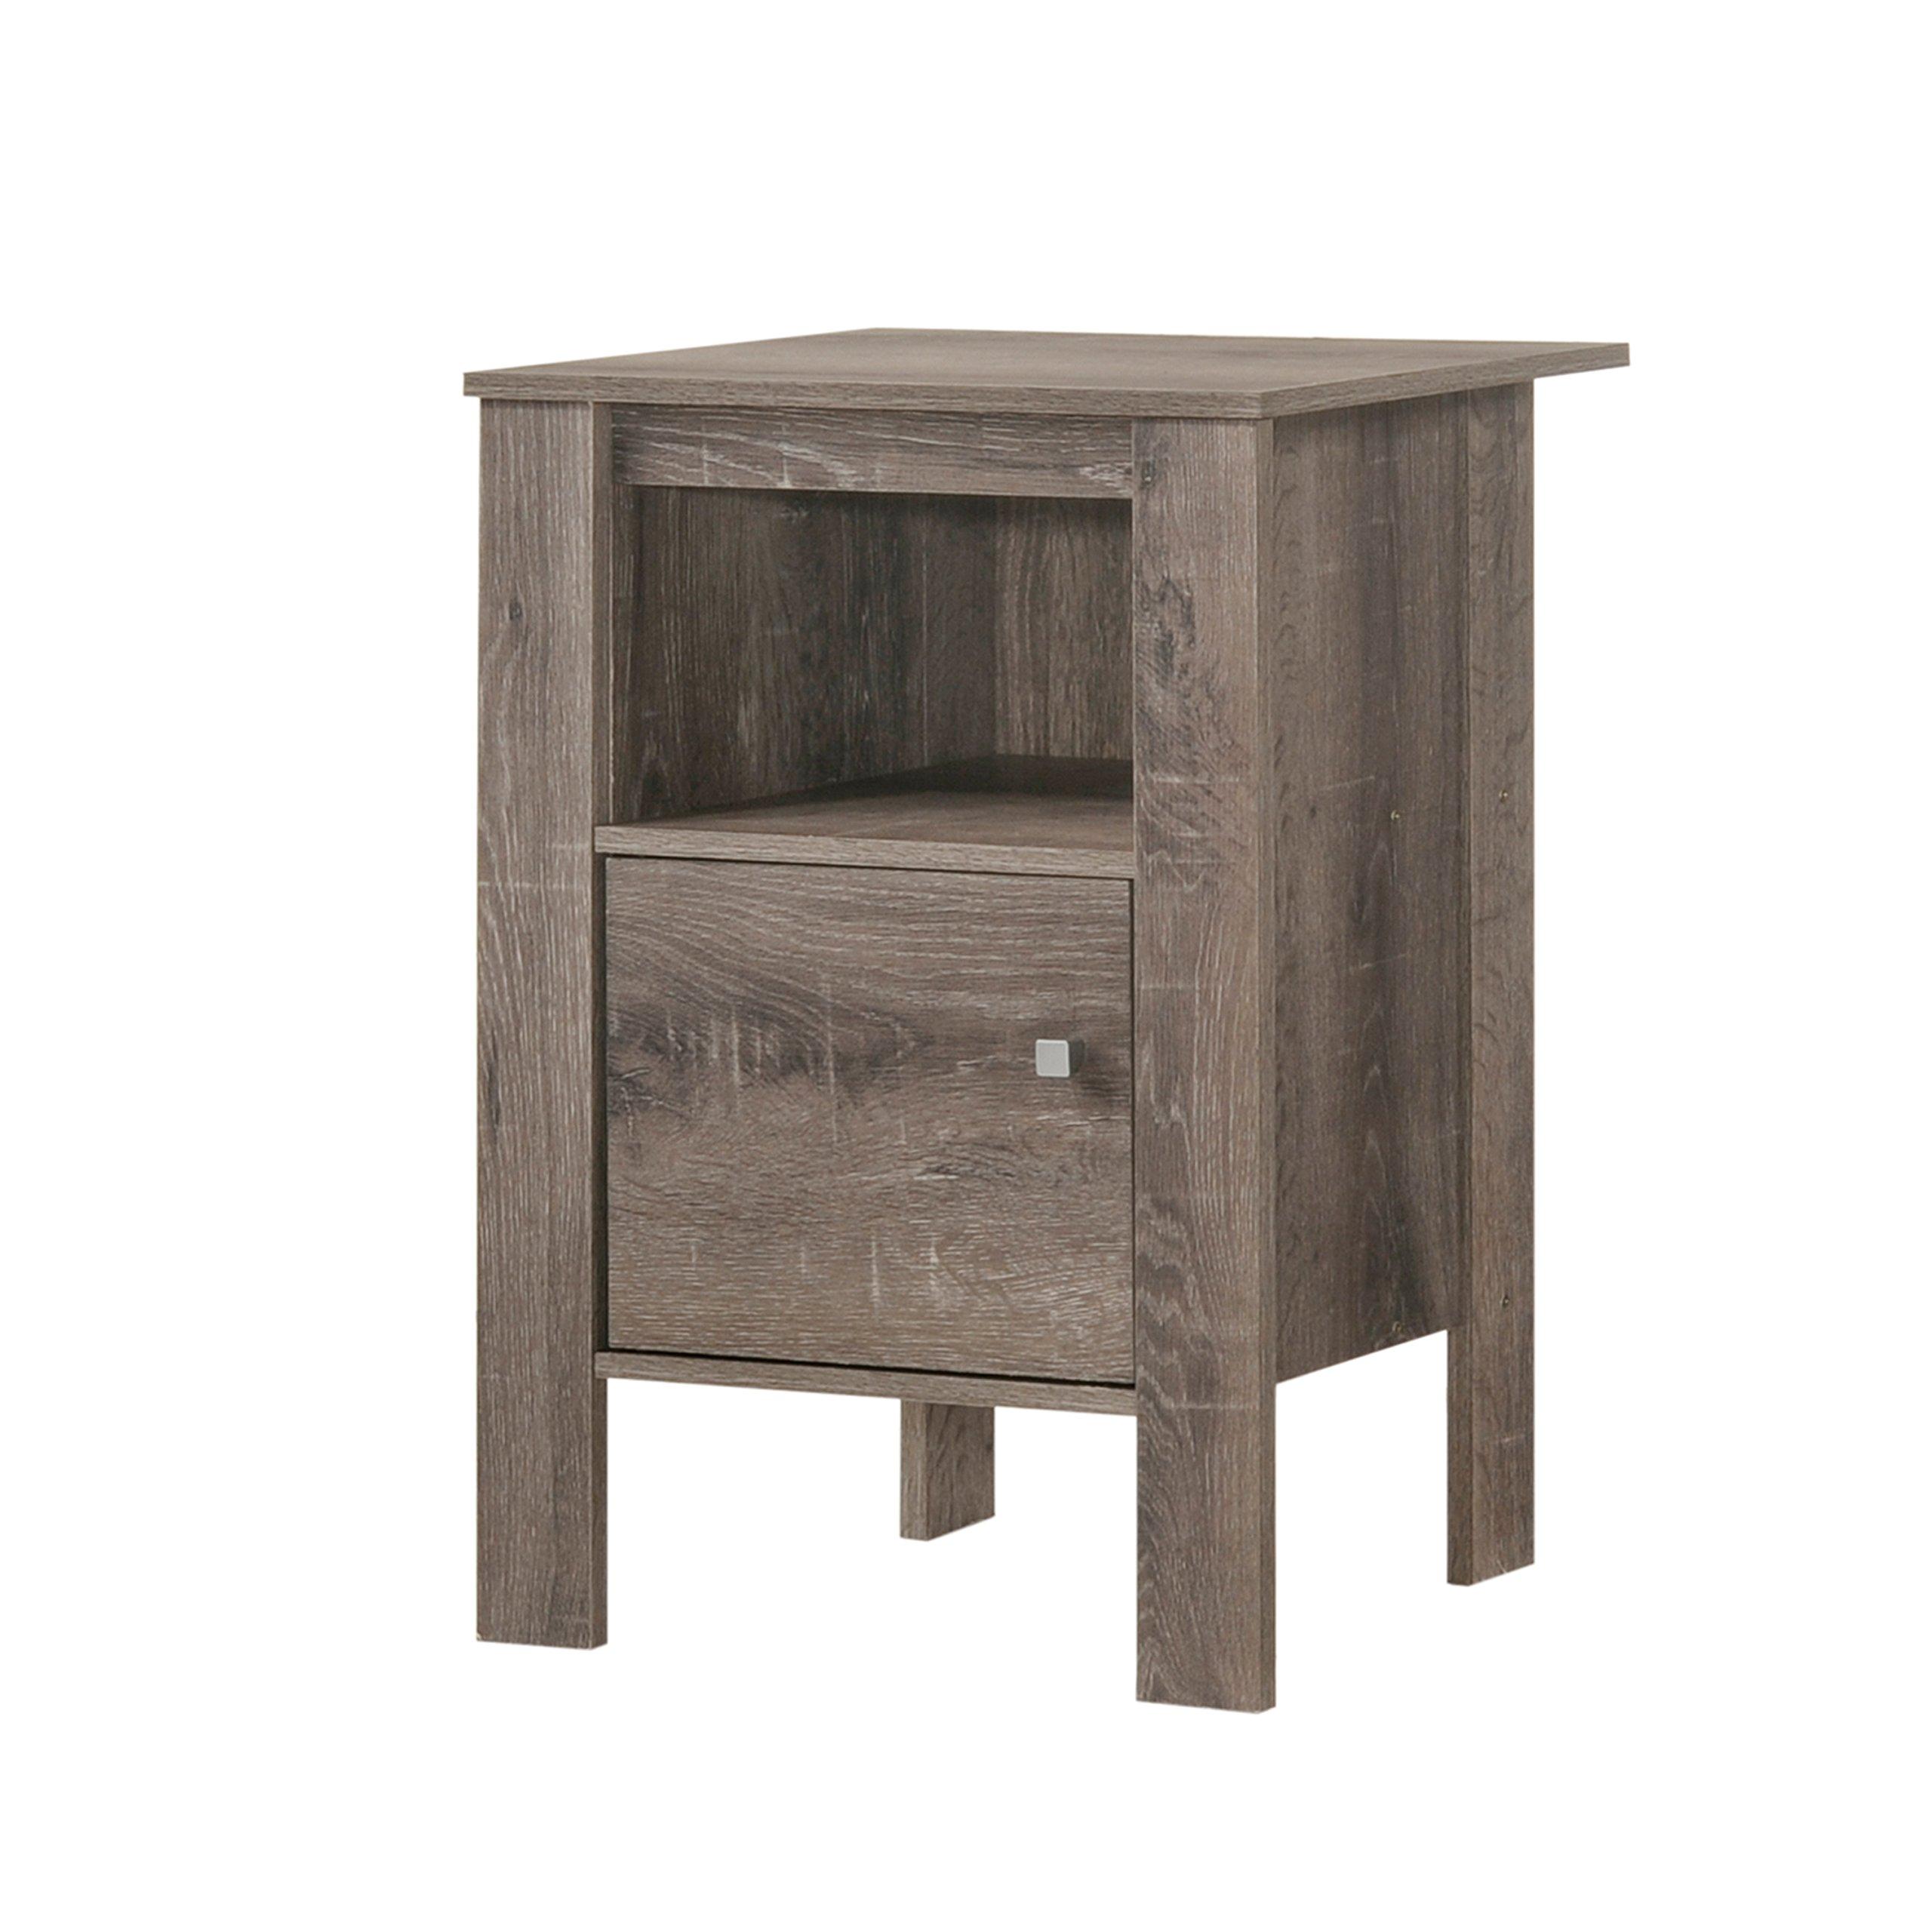 HOMES: Inside + Out IDF-AC802TA Side Table, Rustic Oak